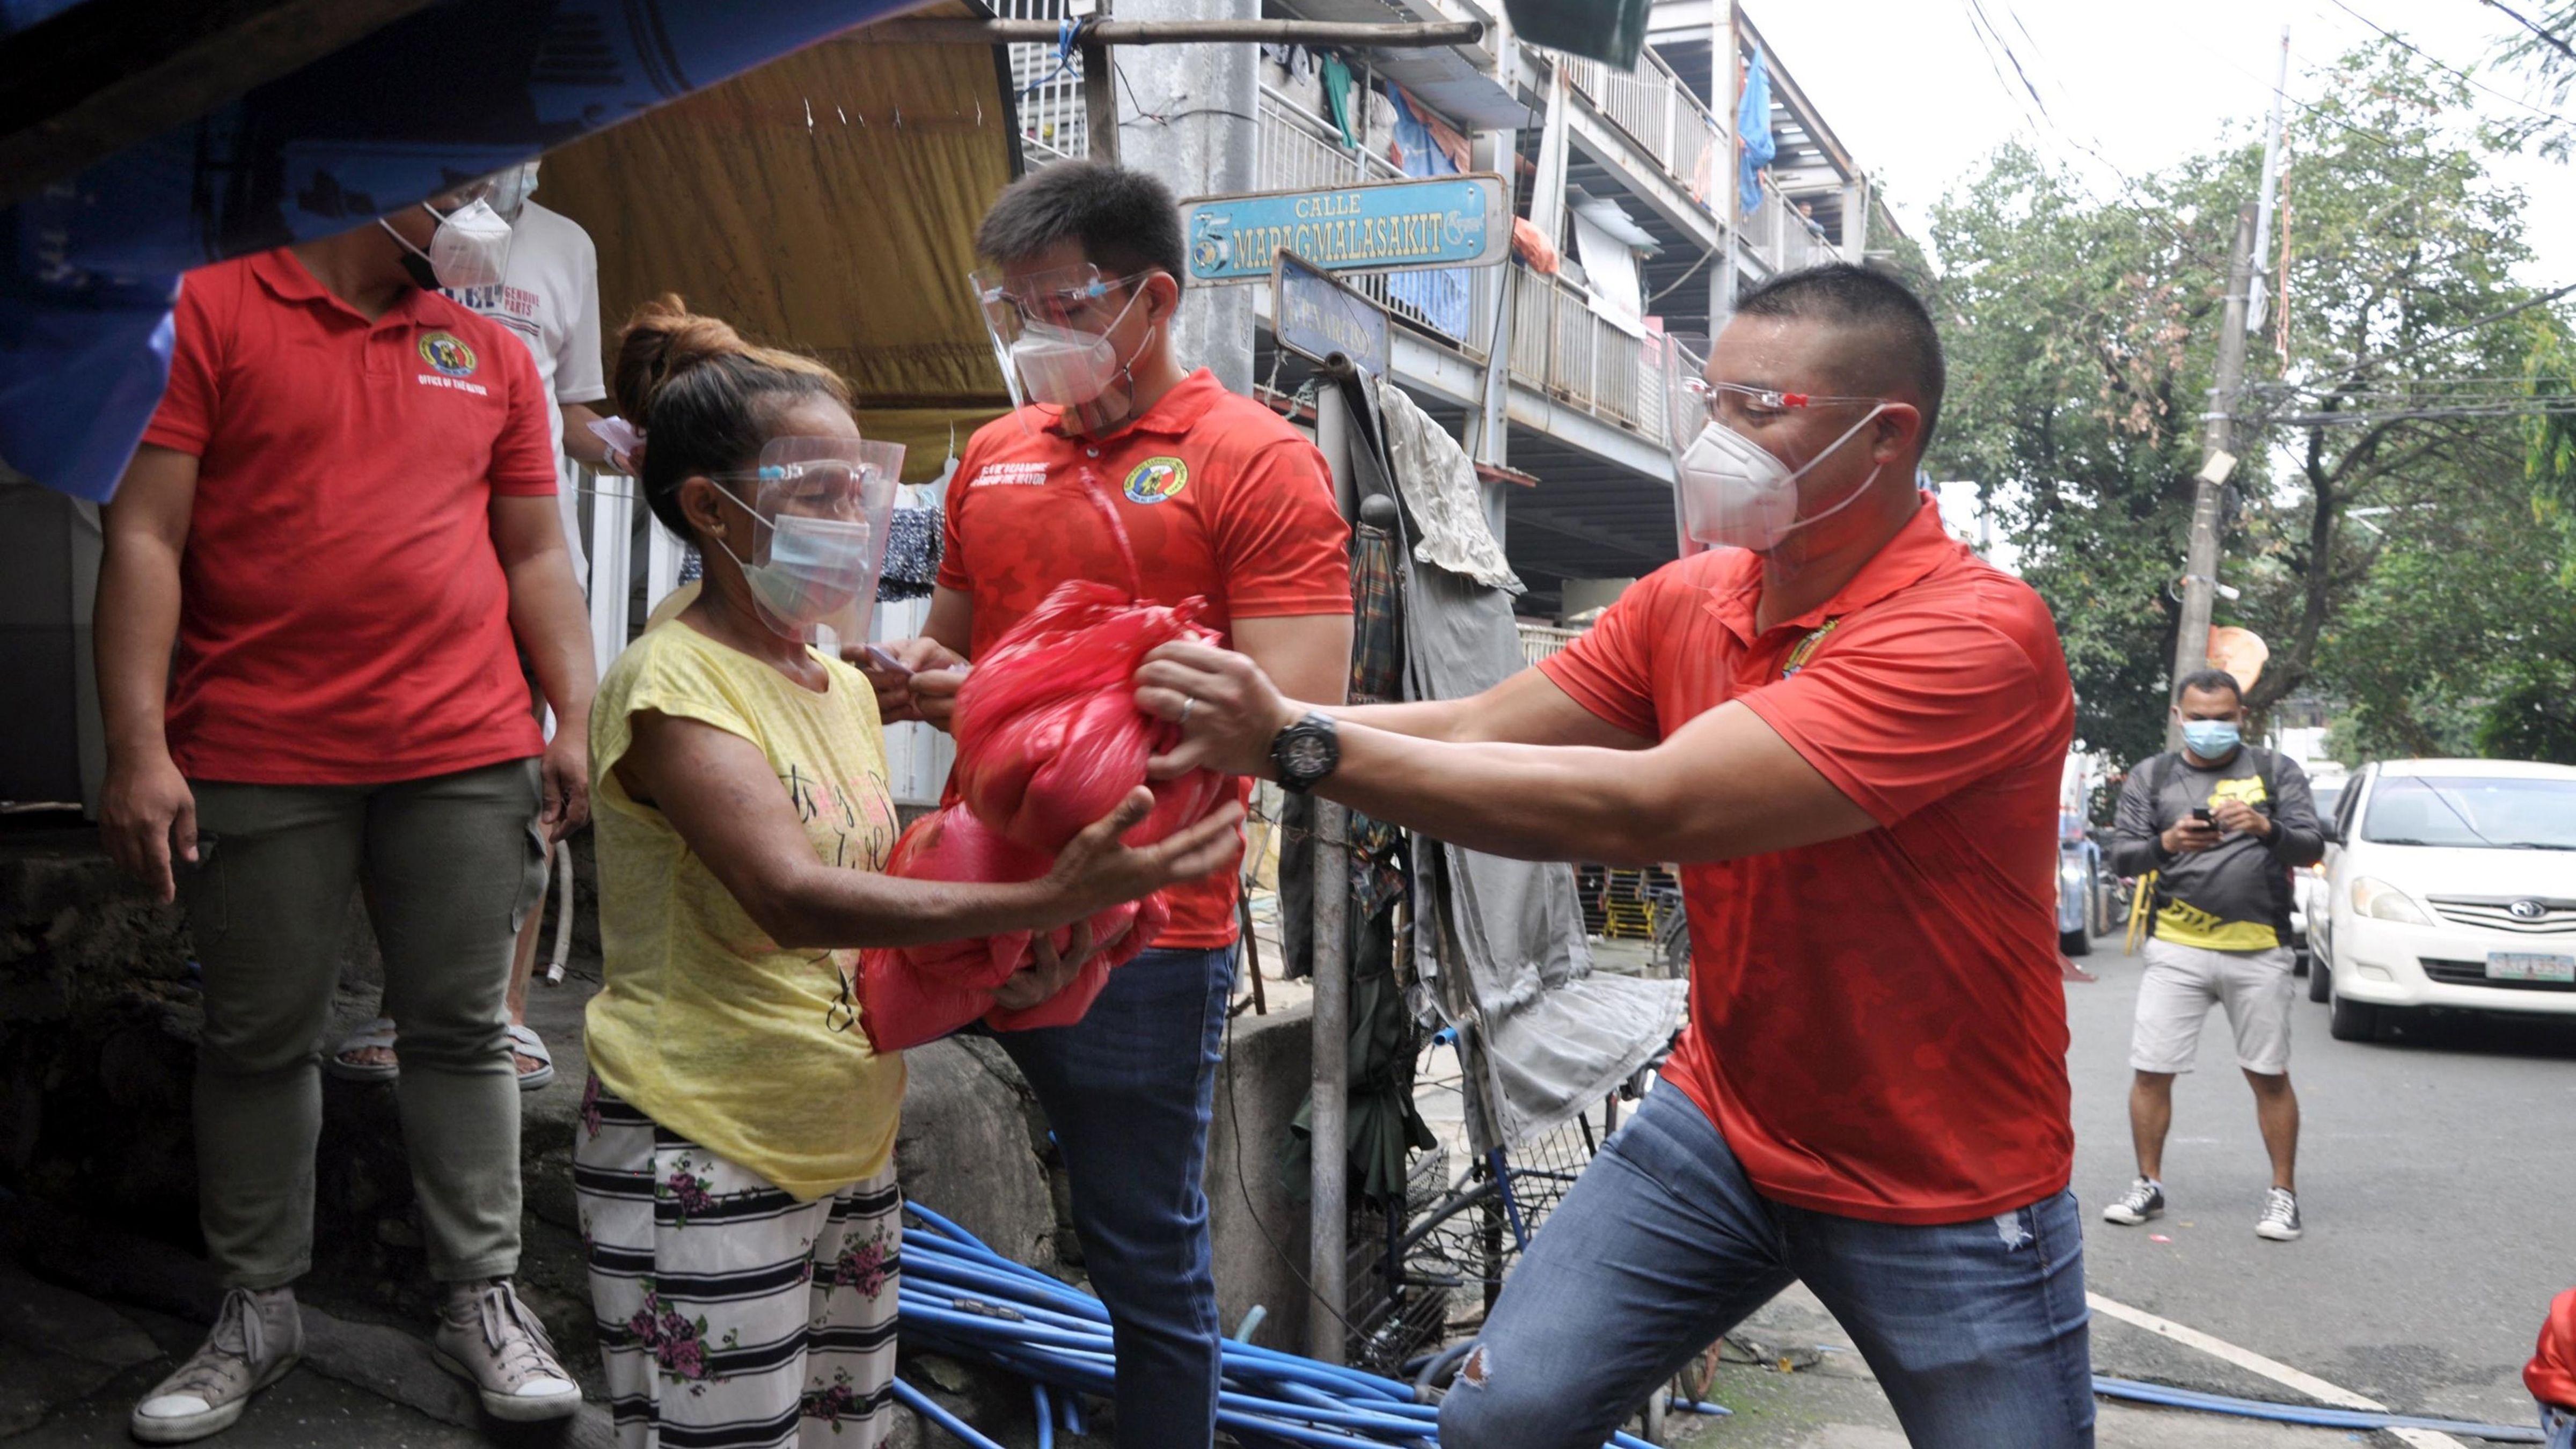 MORE AYUDA FOR SAN JUAN'S RESIDENTS photo by Danny Querubin